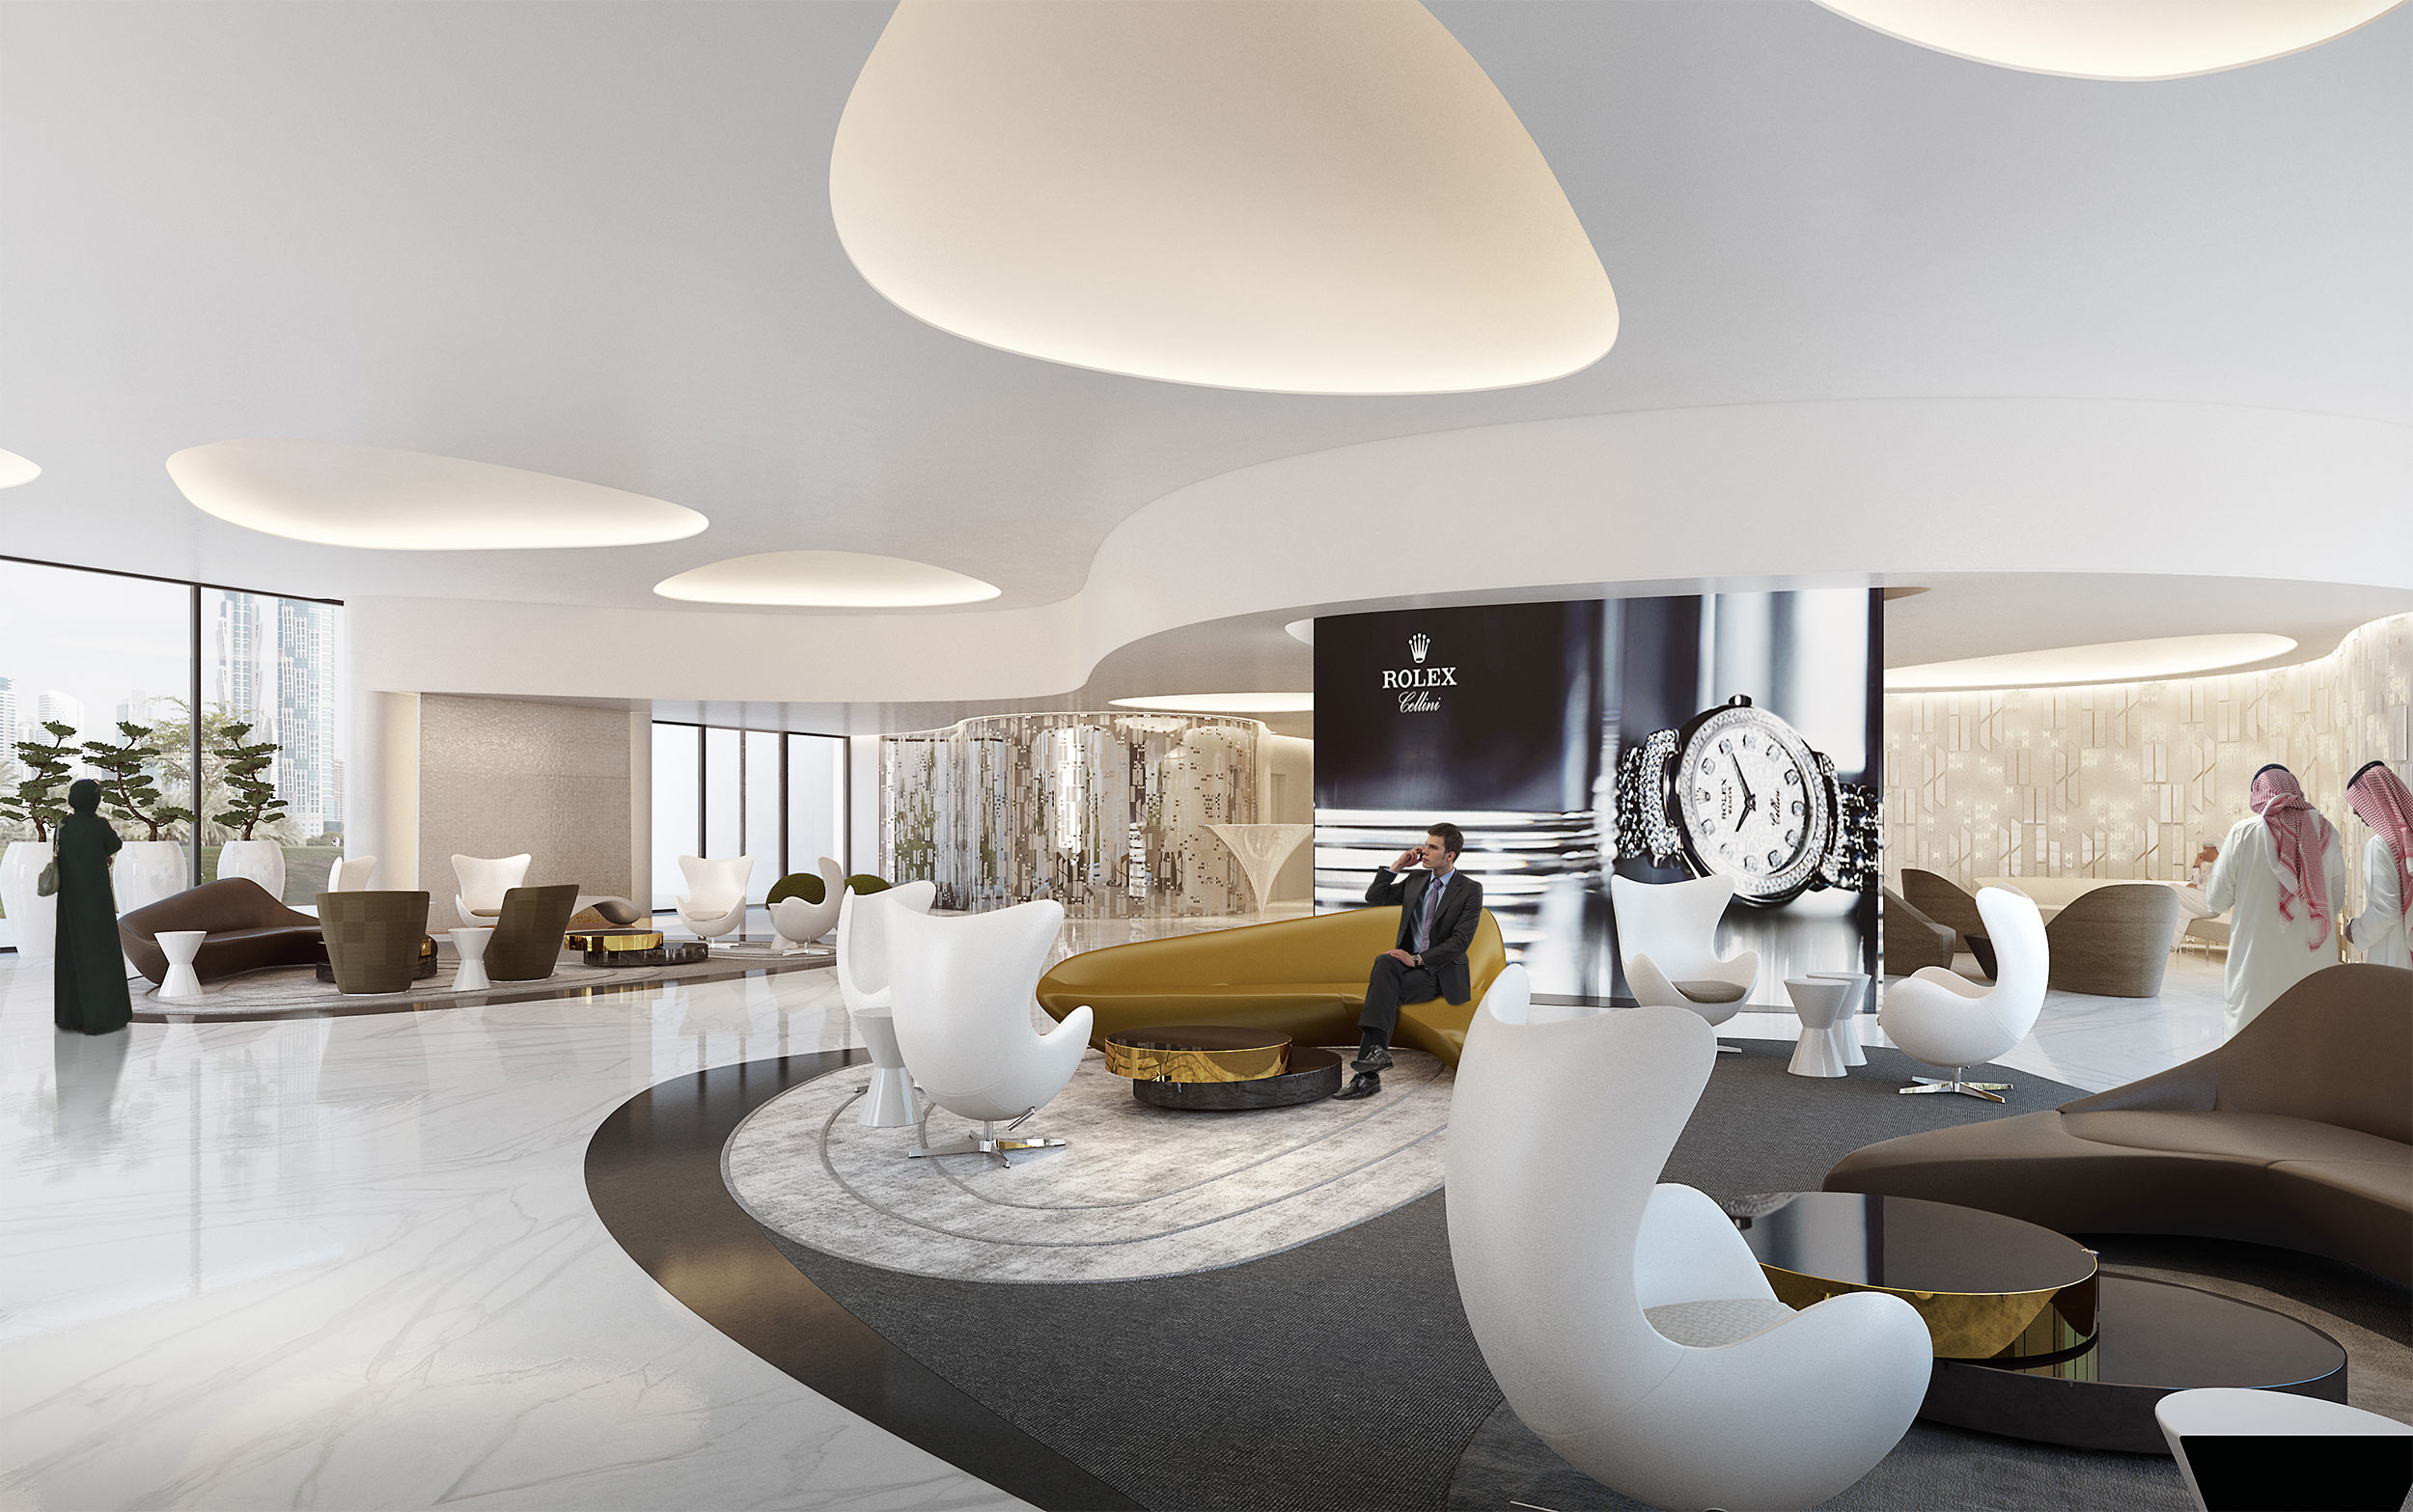 Private Jet Executive Lounge in Dubai